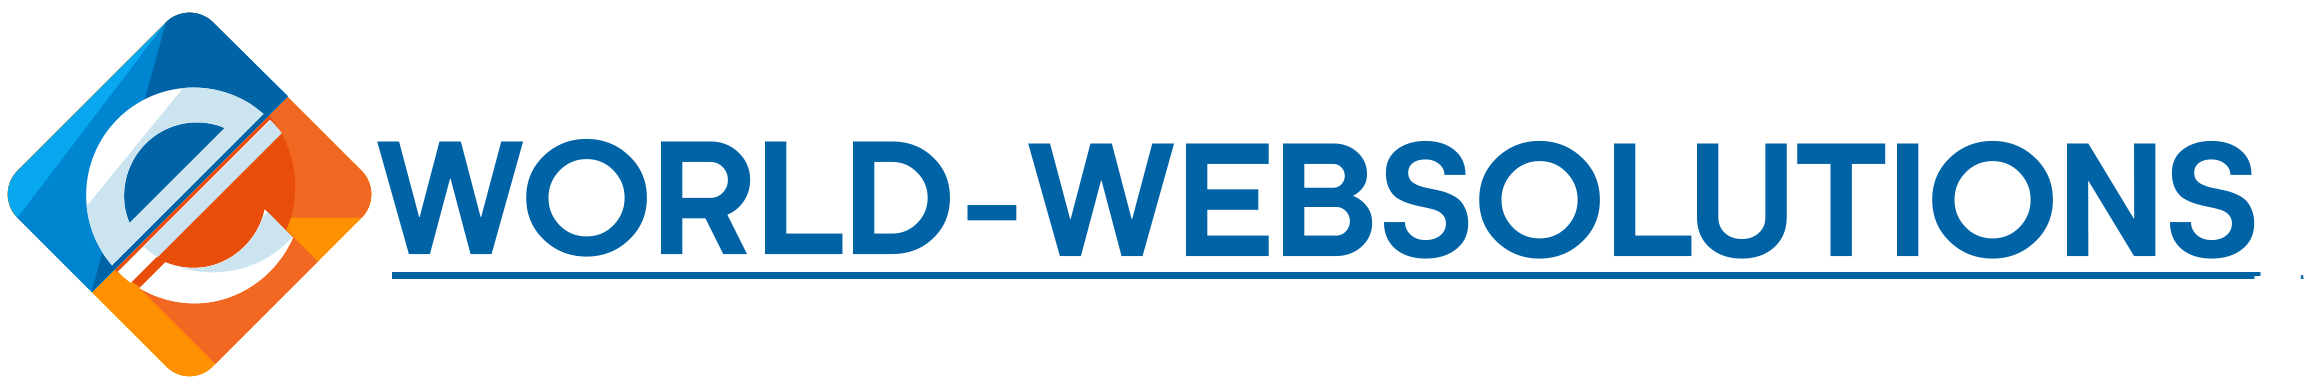 Eworld-Web Solutions Logo